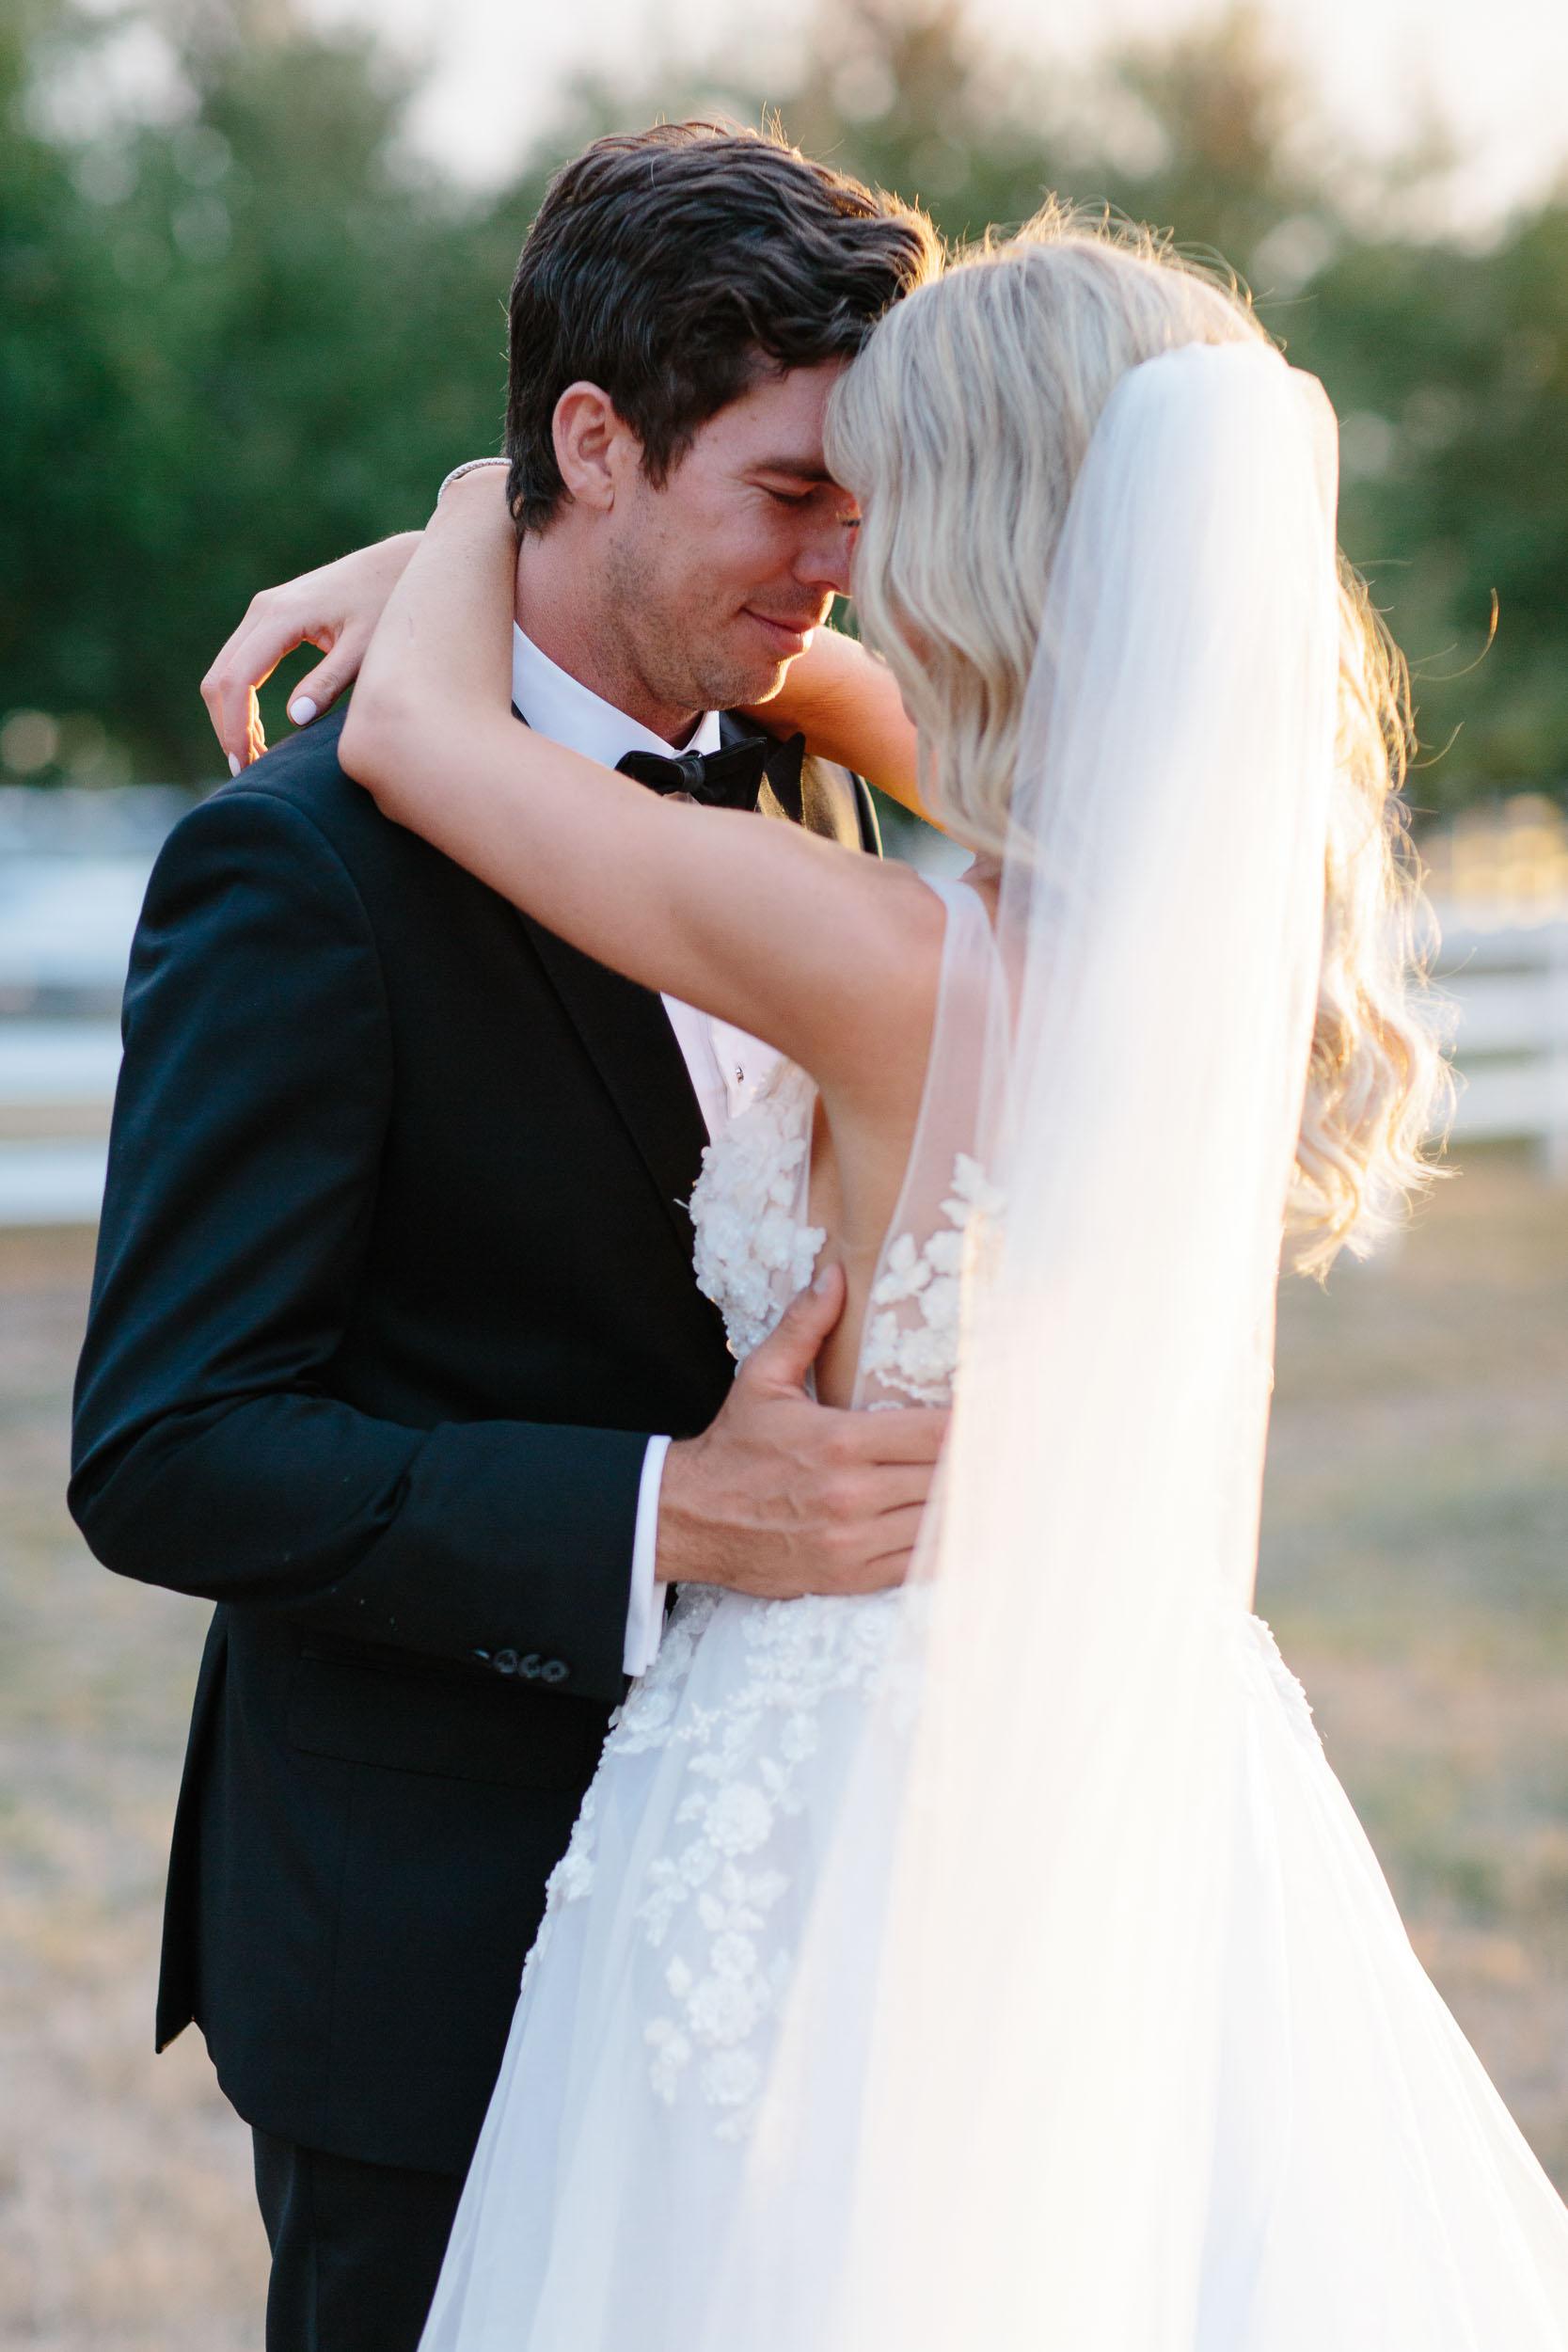 Kas-Richards-Mornington-Peninsula-Private-Property-Wedding-Marianna-Hardwick-Gown-676.jpg